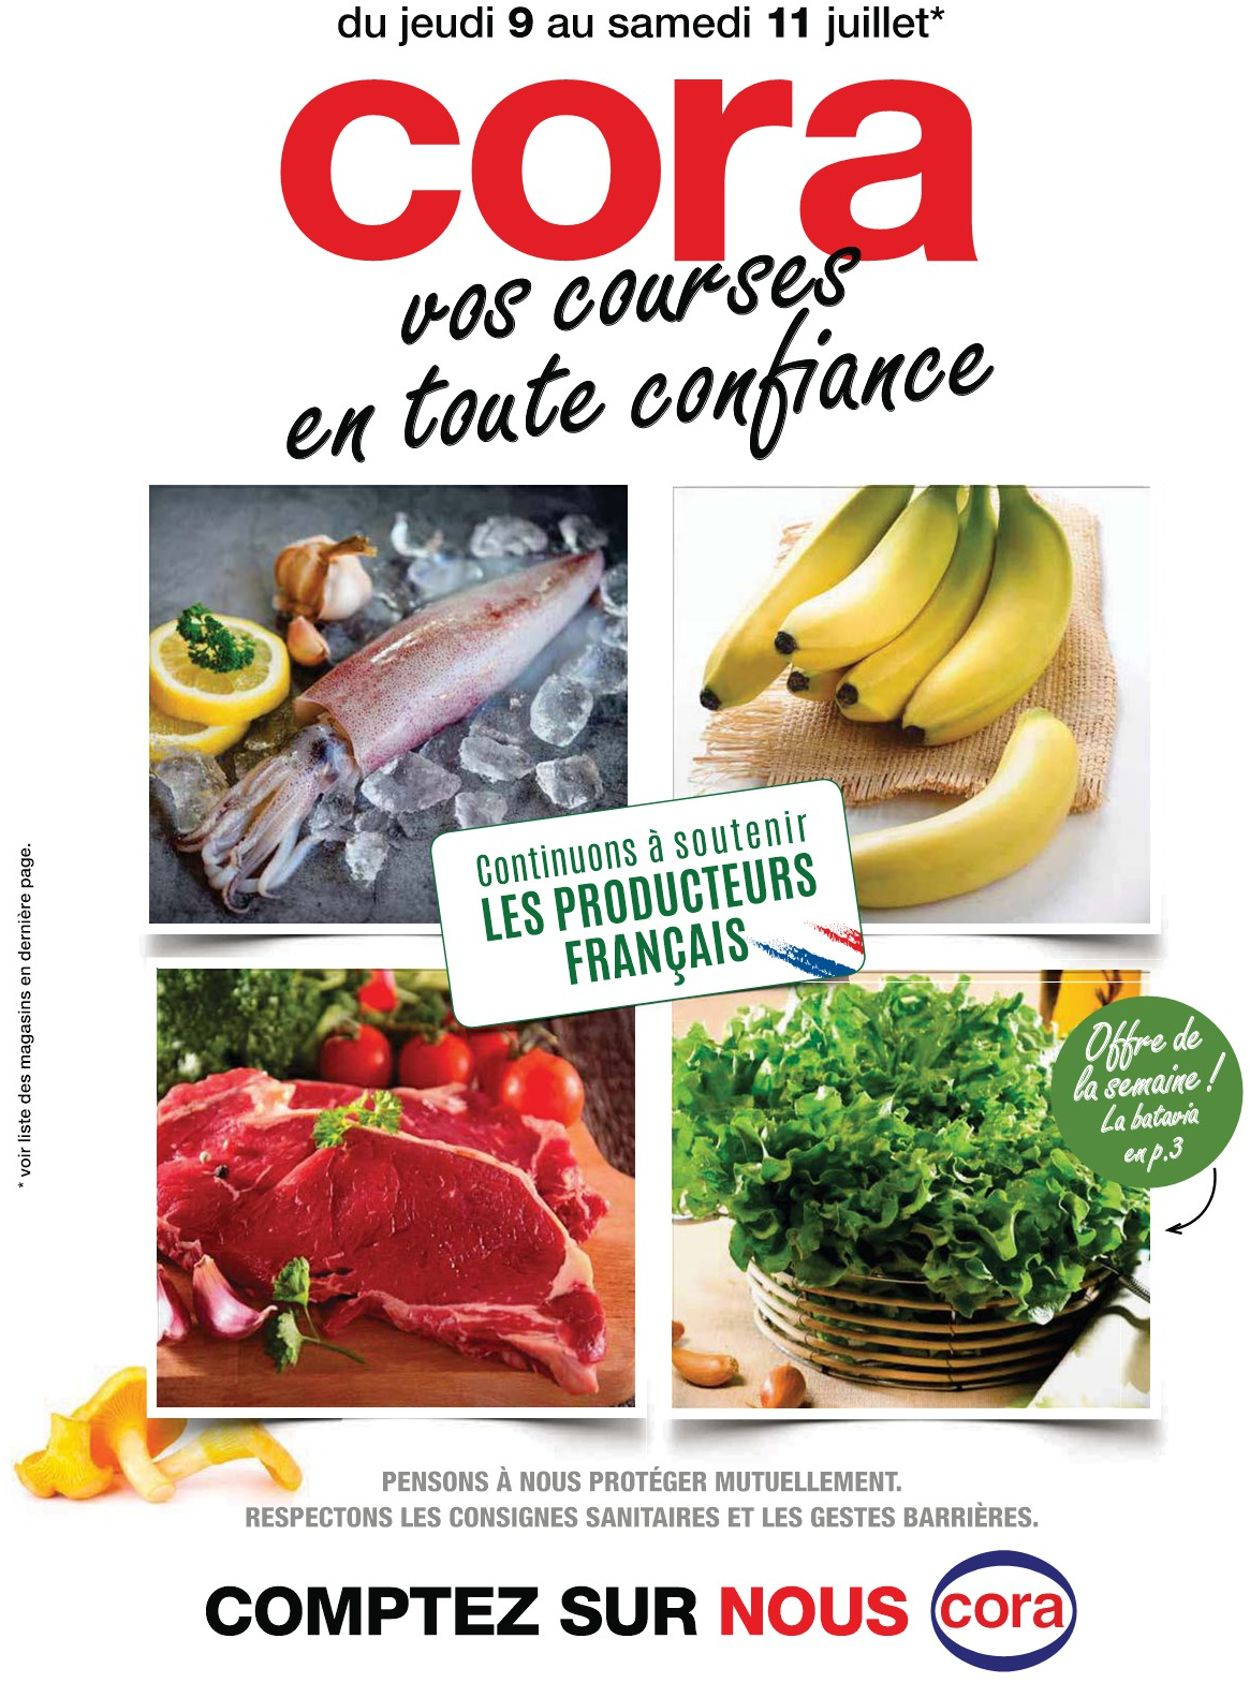 Cora Catalogue - 09.07-11.07.2020